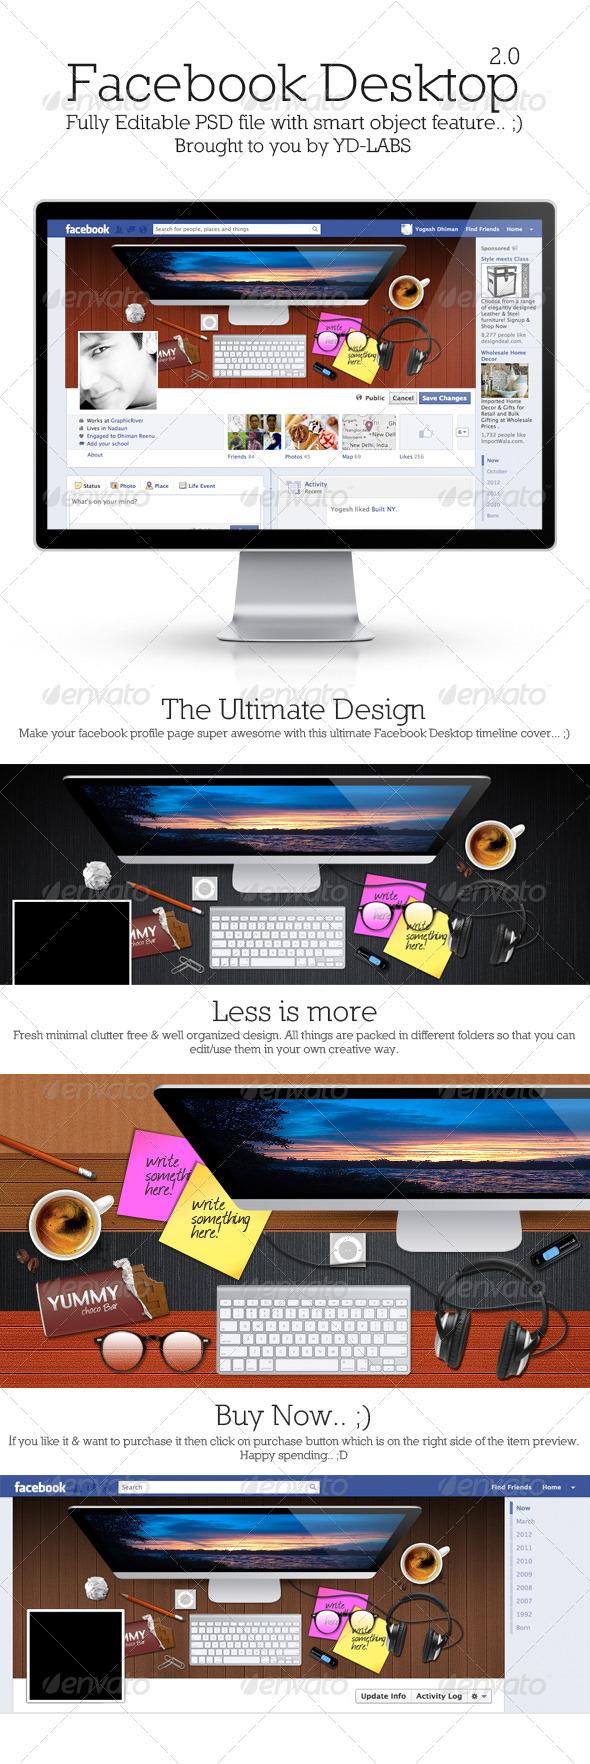 GraphicRiver FB Desktop 2.0 3341012